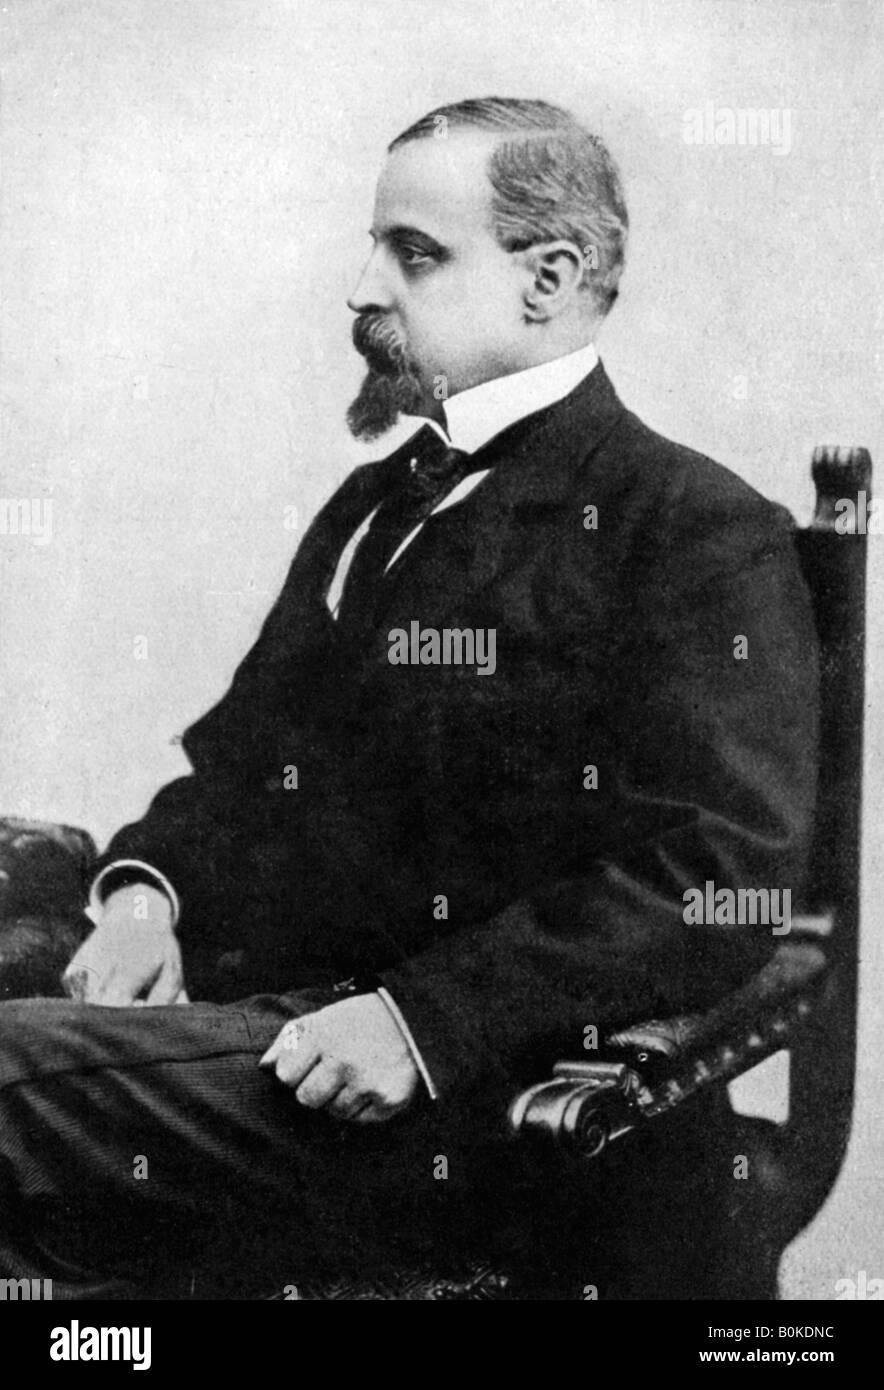 Henryk Sienkiewicz, Polish novelist and publicist, late 19th century, (c1920). - Stock Image